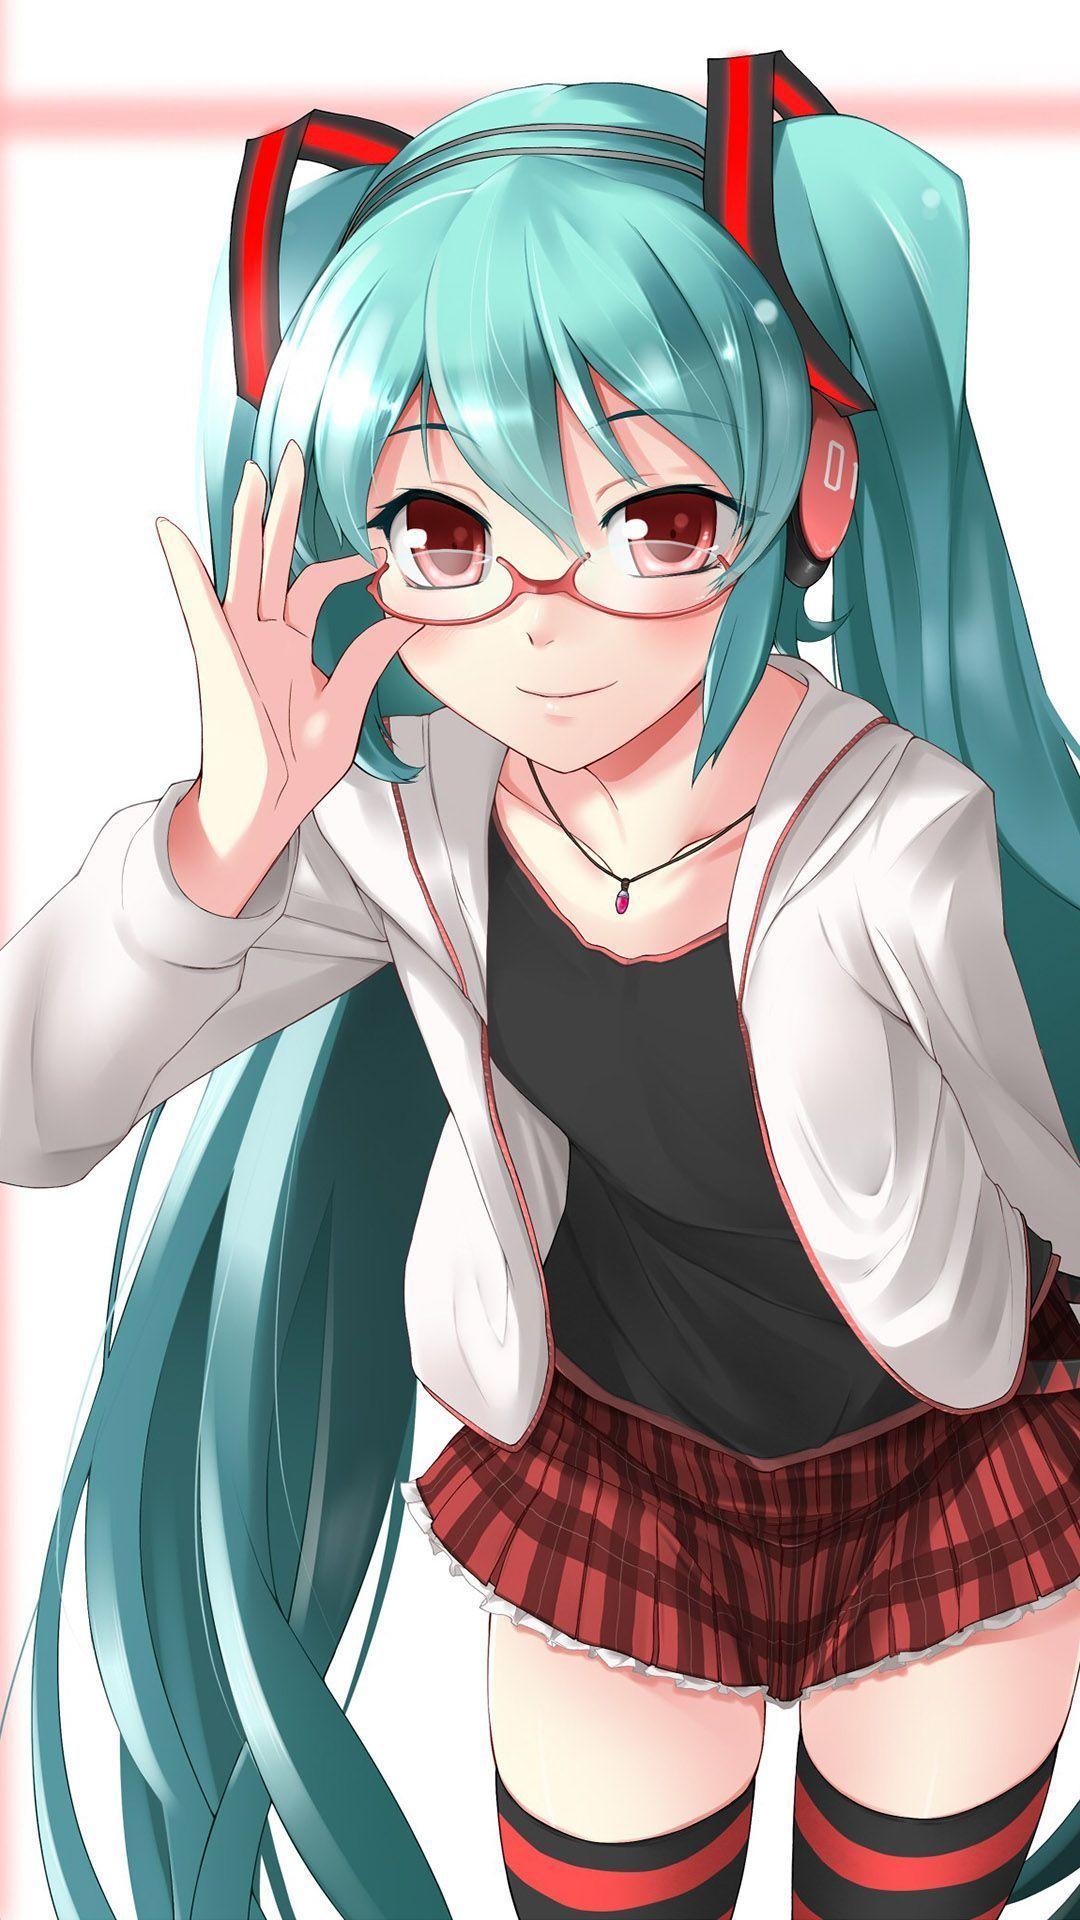 Hatsune Miku Vocaloid Mobile Wallpaper 7561 Anime